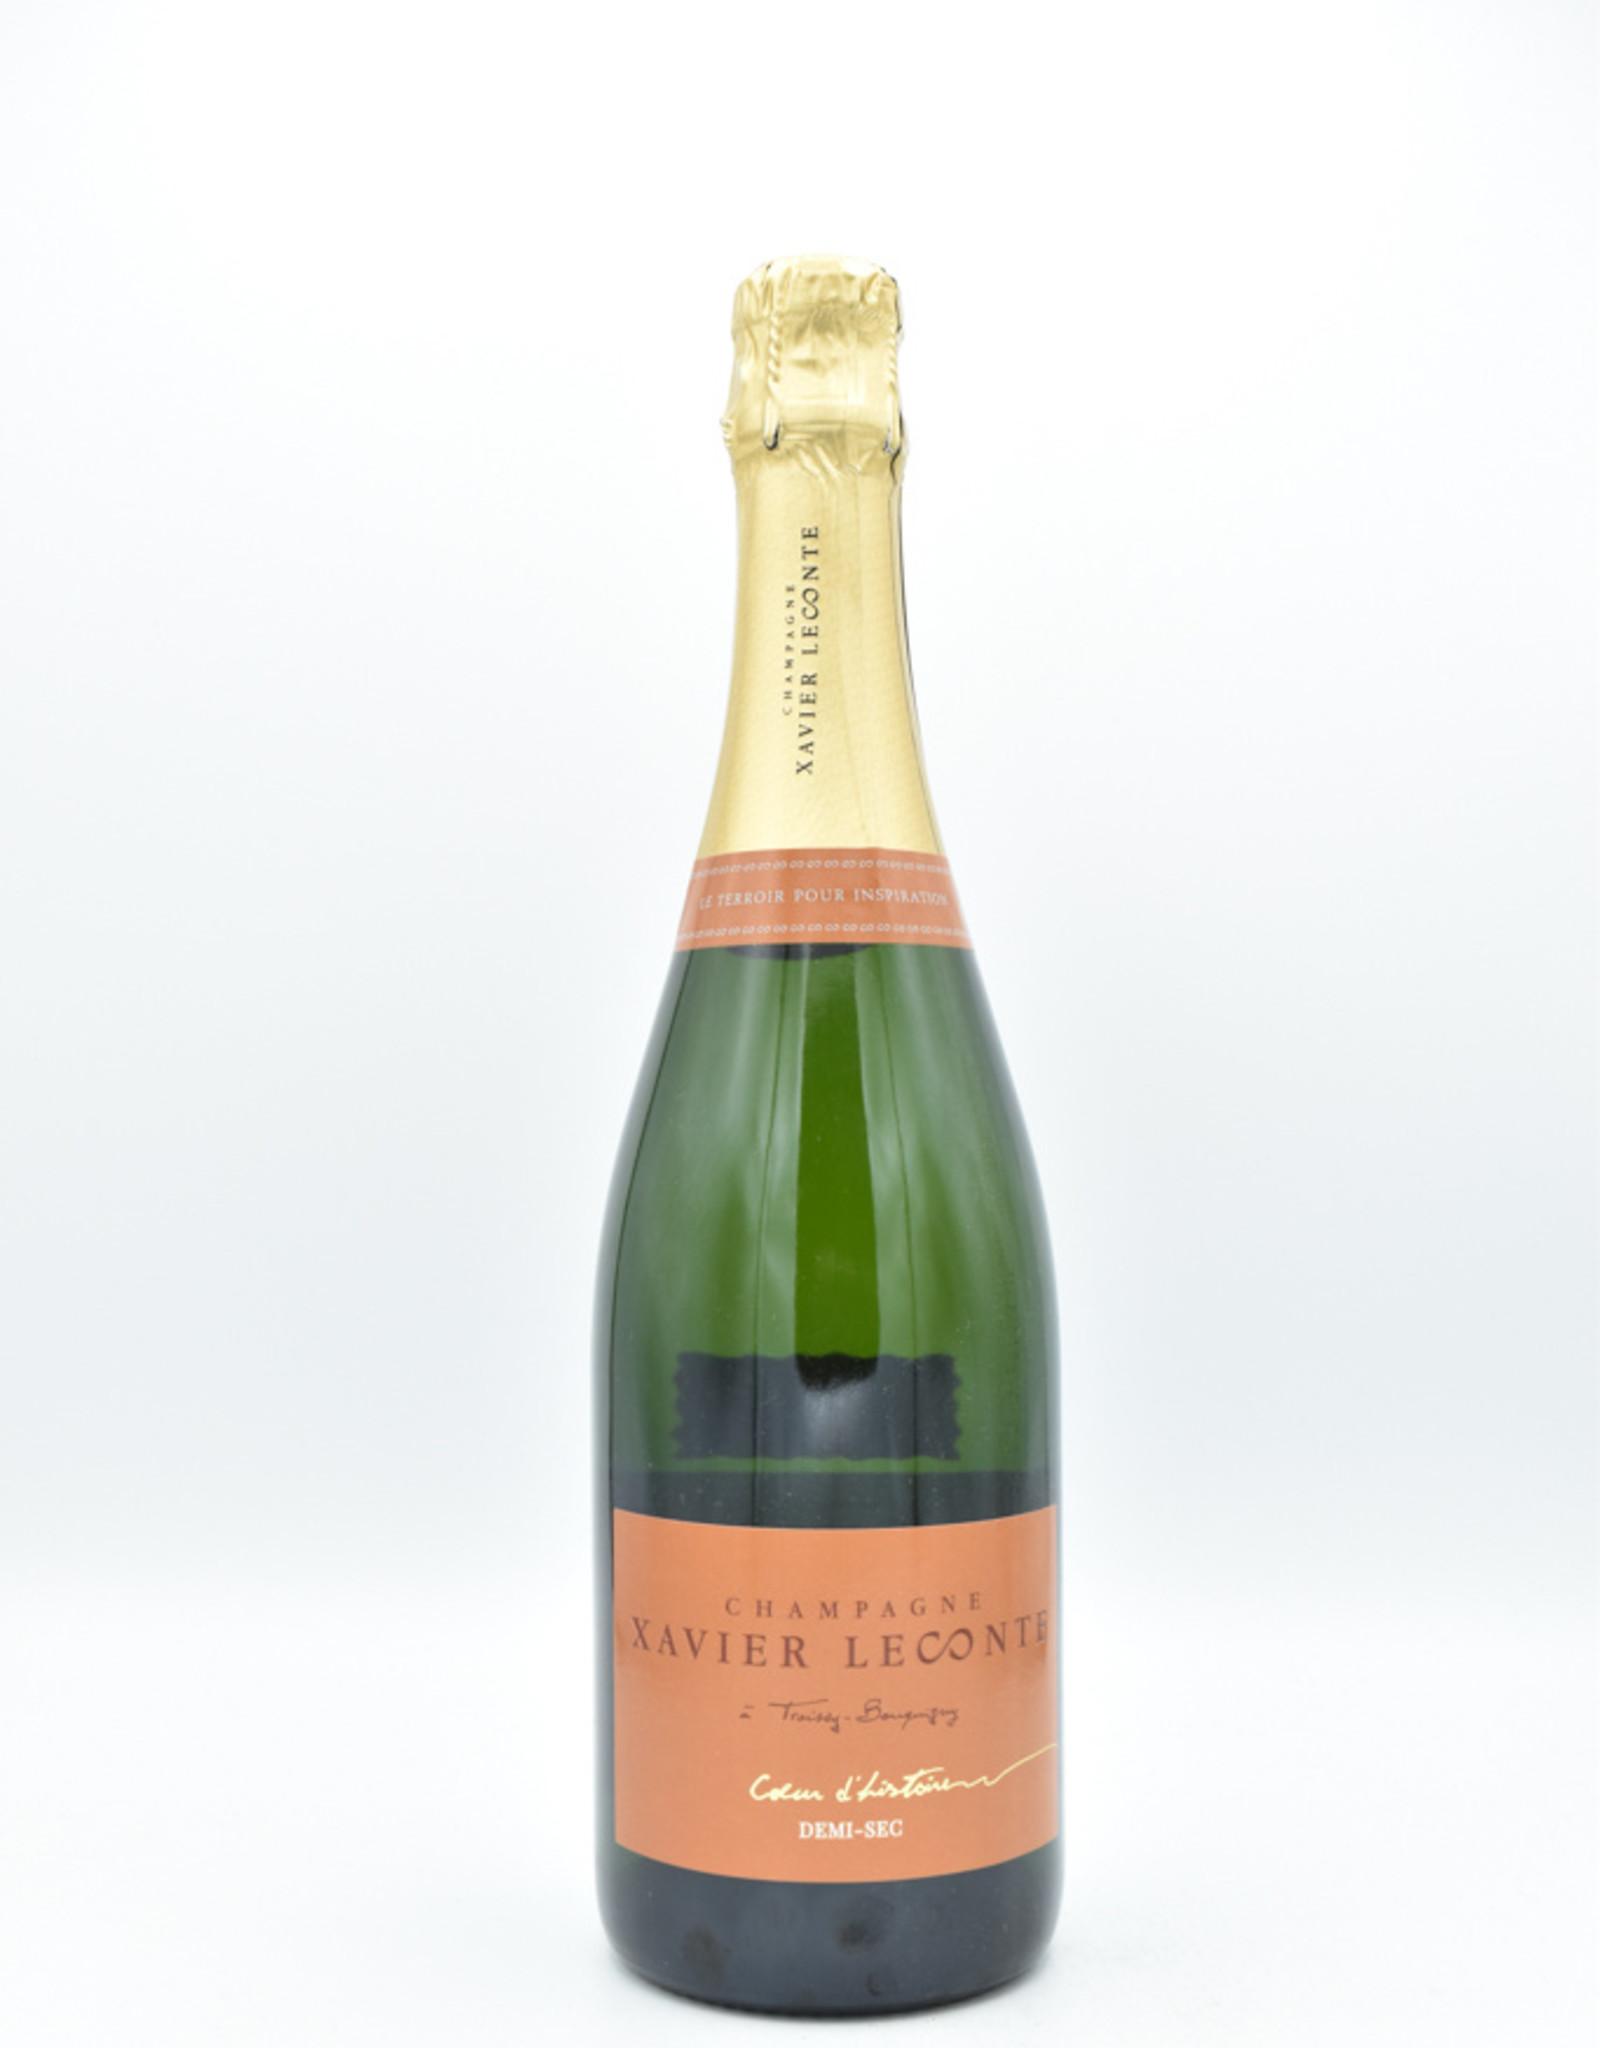 Champagne Xavier Leconte Champagne Xavier Leconte - Coeur d'Histoire - Demi-Sec